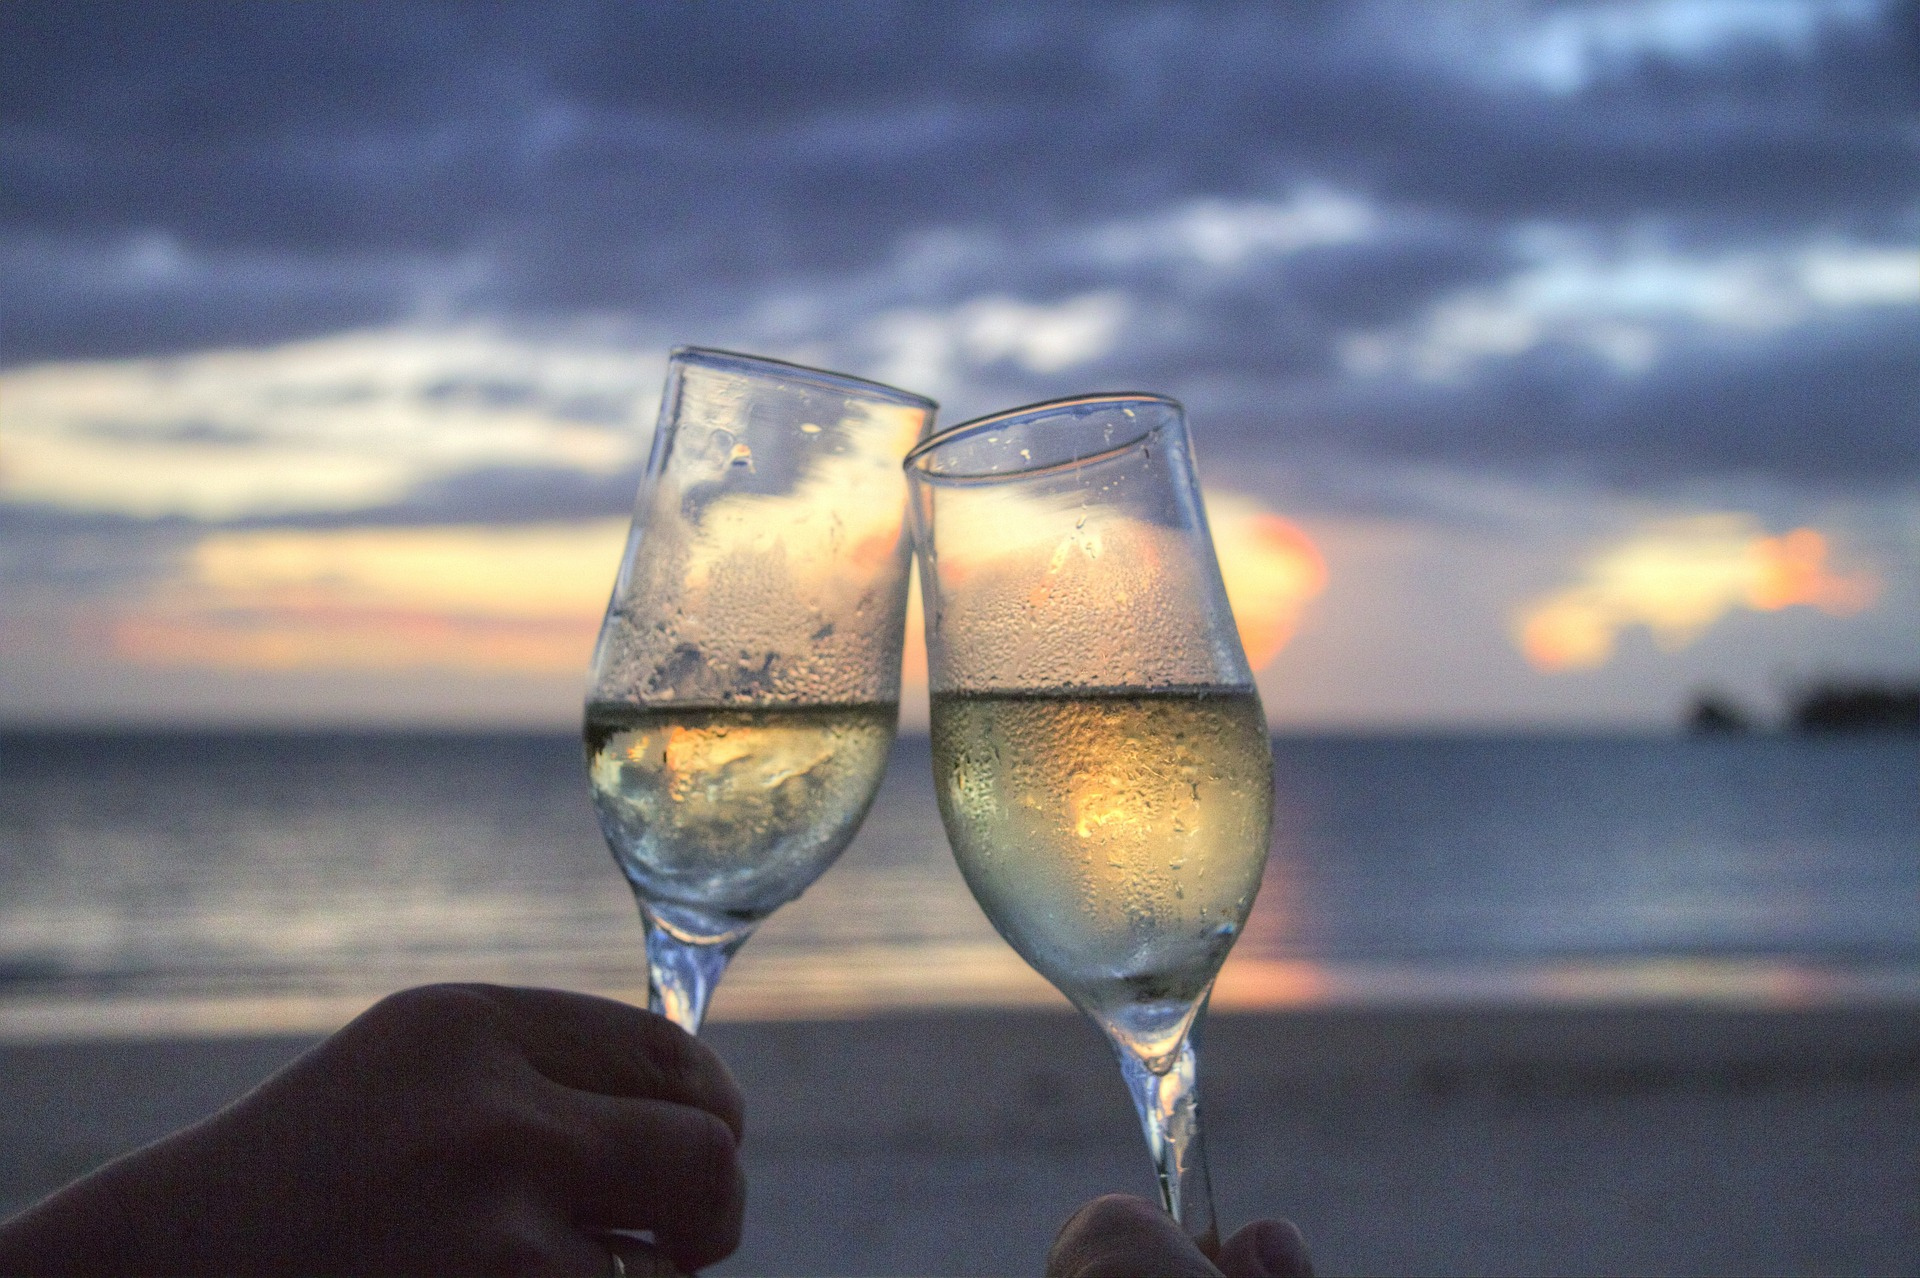 Romance & Celebrations